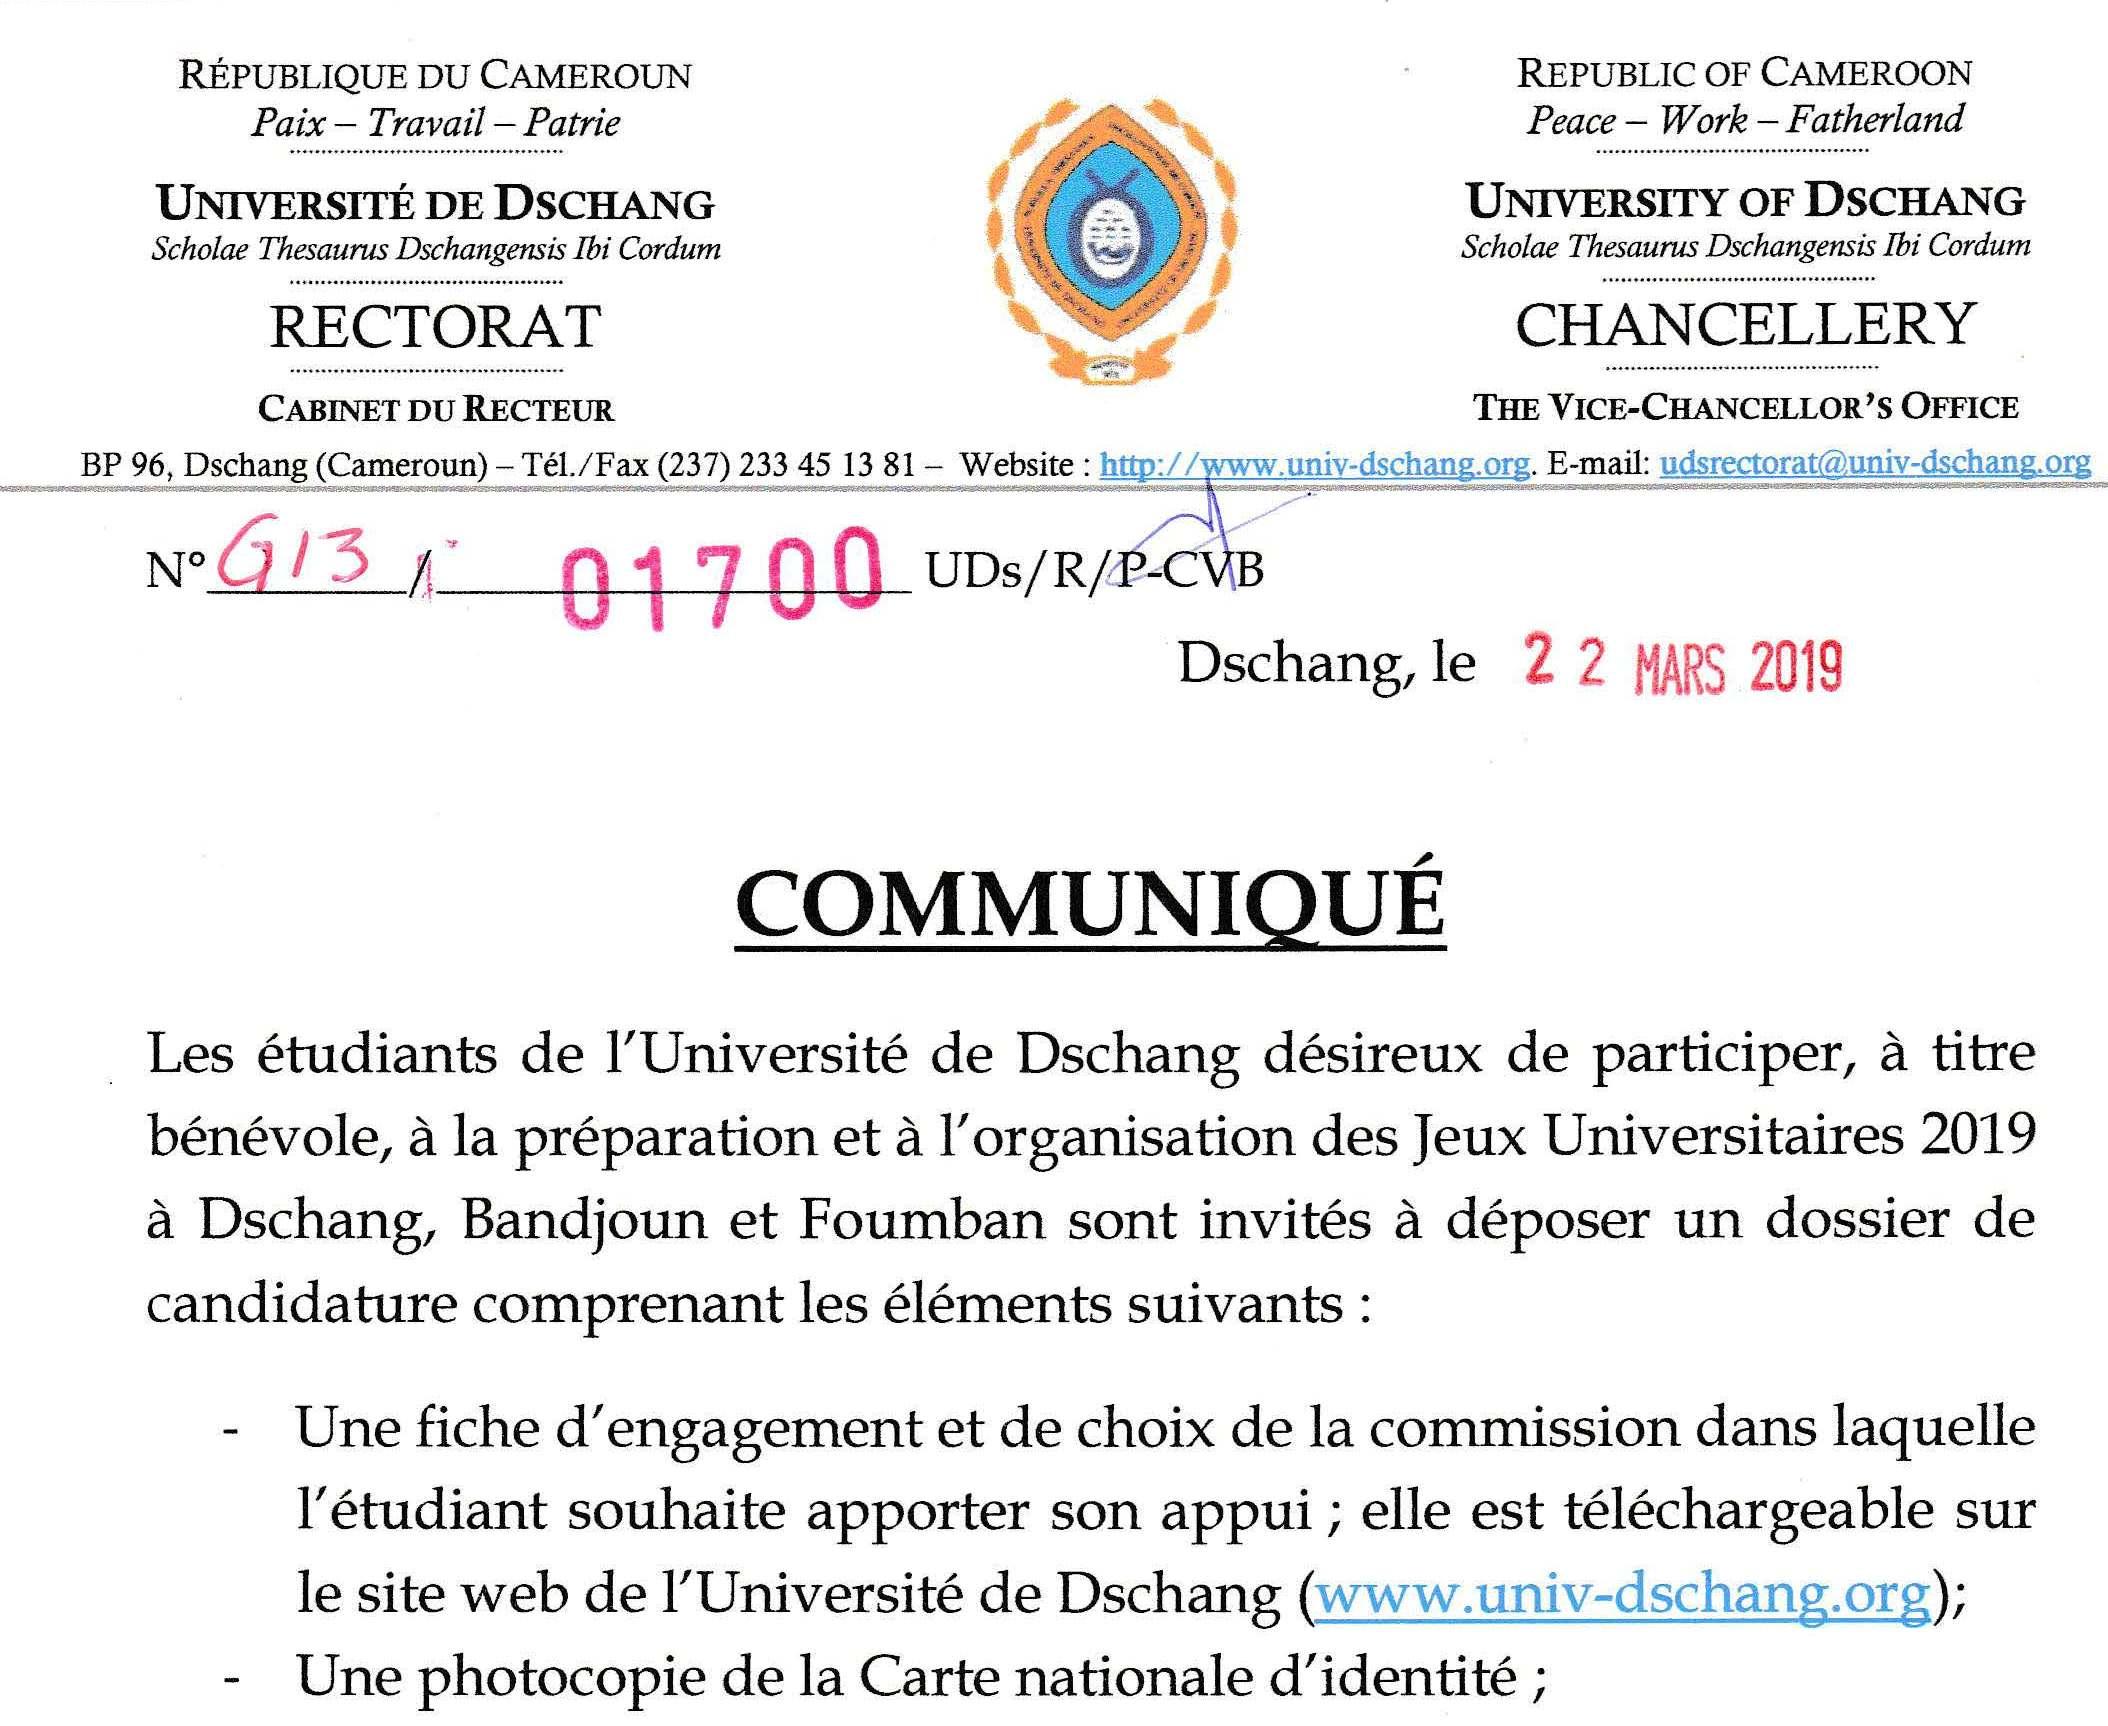 CommuniqueBonevoleJU2019-FR